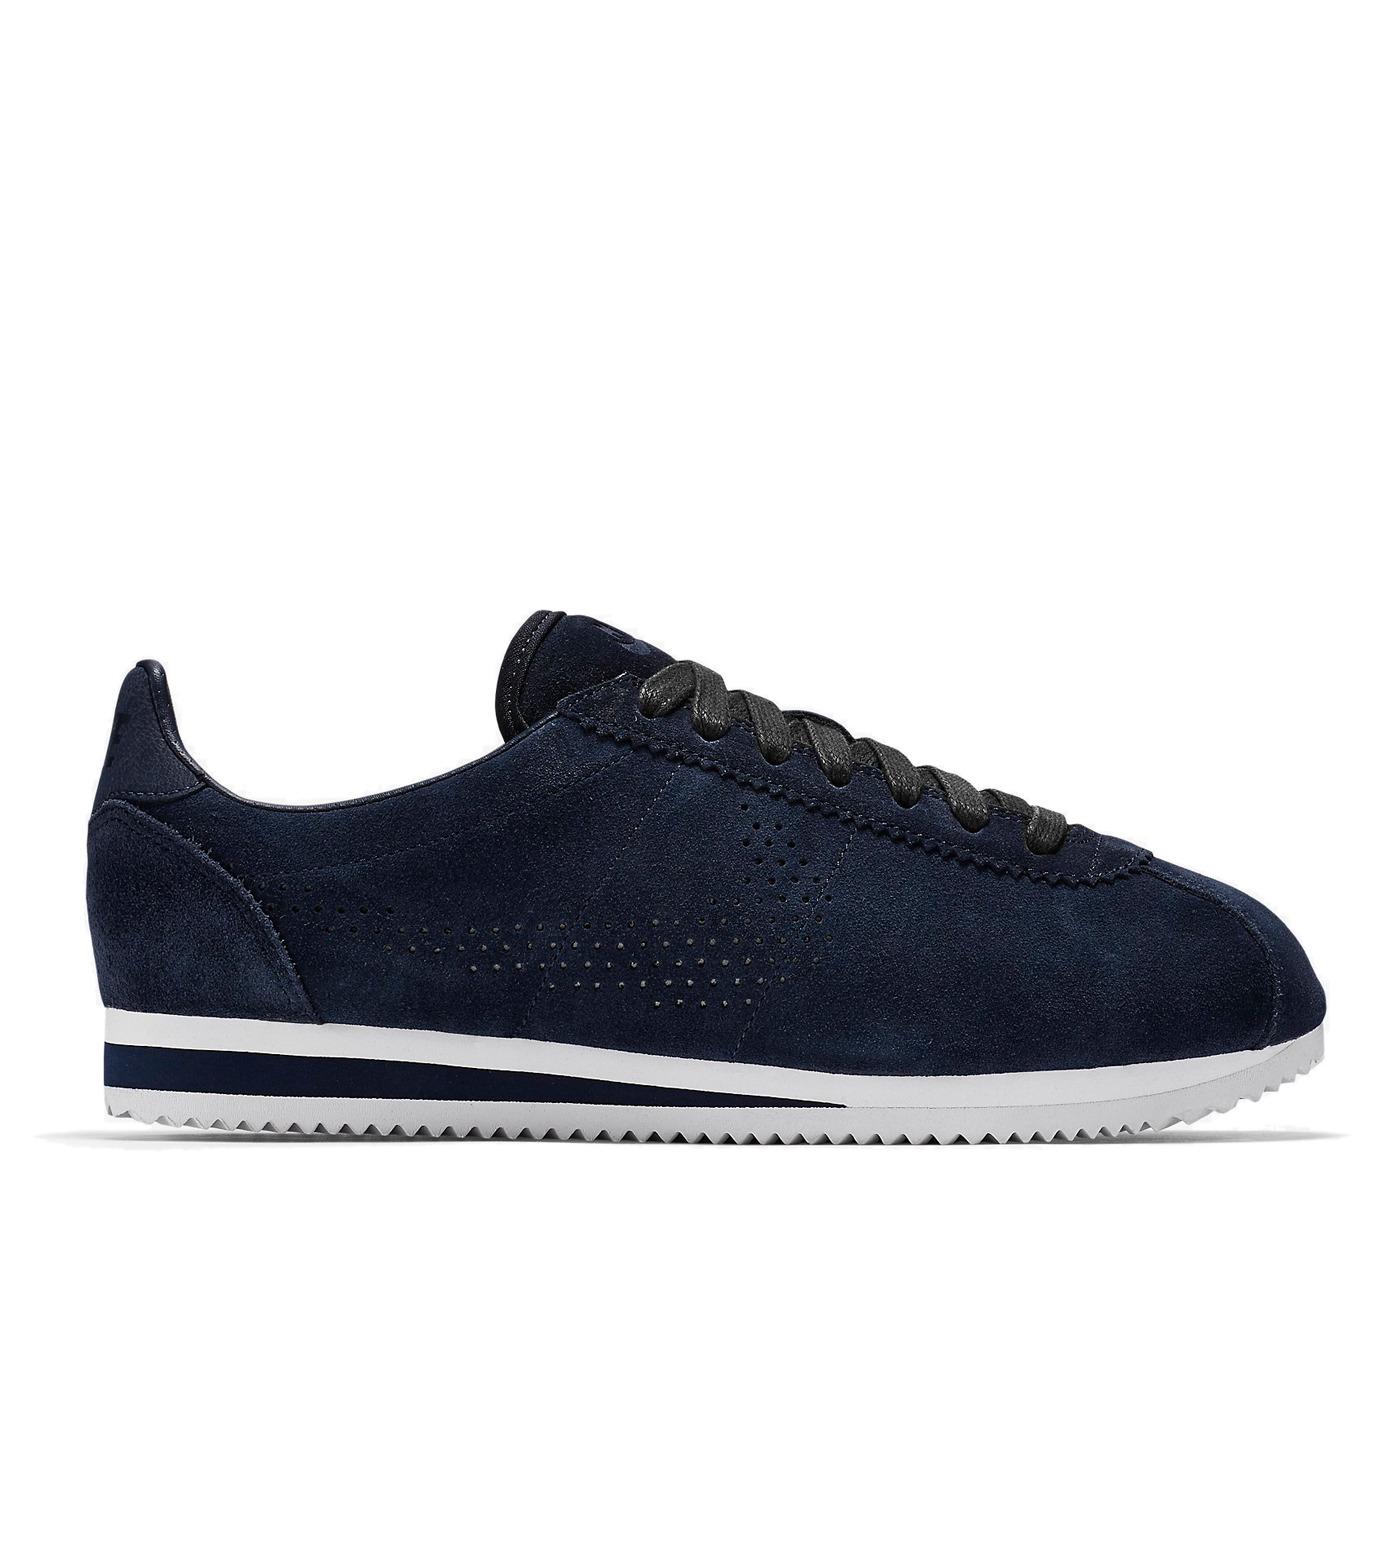 NIKE(ナイキ)のCLASSIC CORTEZ LX-BLUE(シューズ/shoes)-823914-400-92 拡大詳細画像1